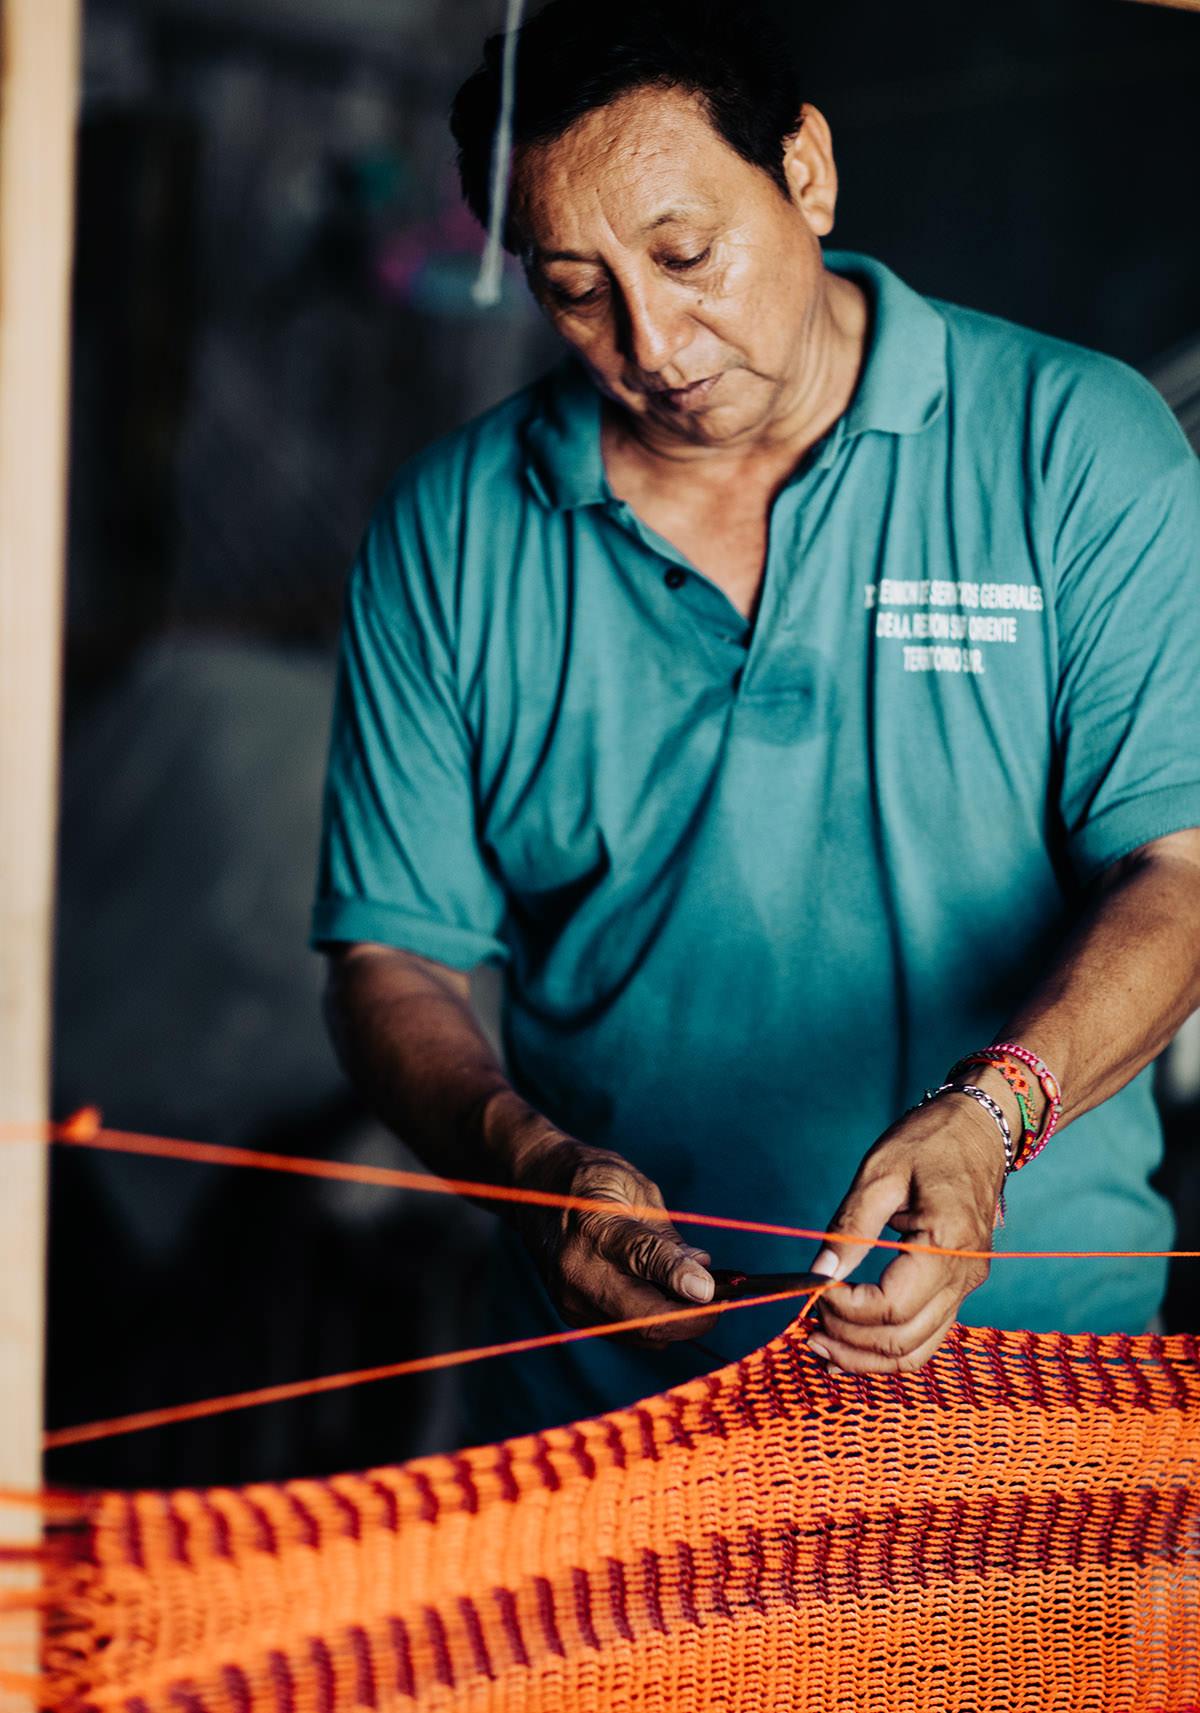 hammock-being-made-puerto-morelos-mexico.jpg